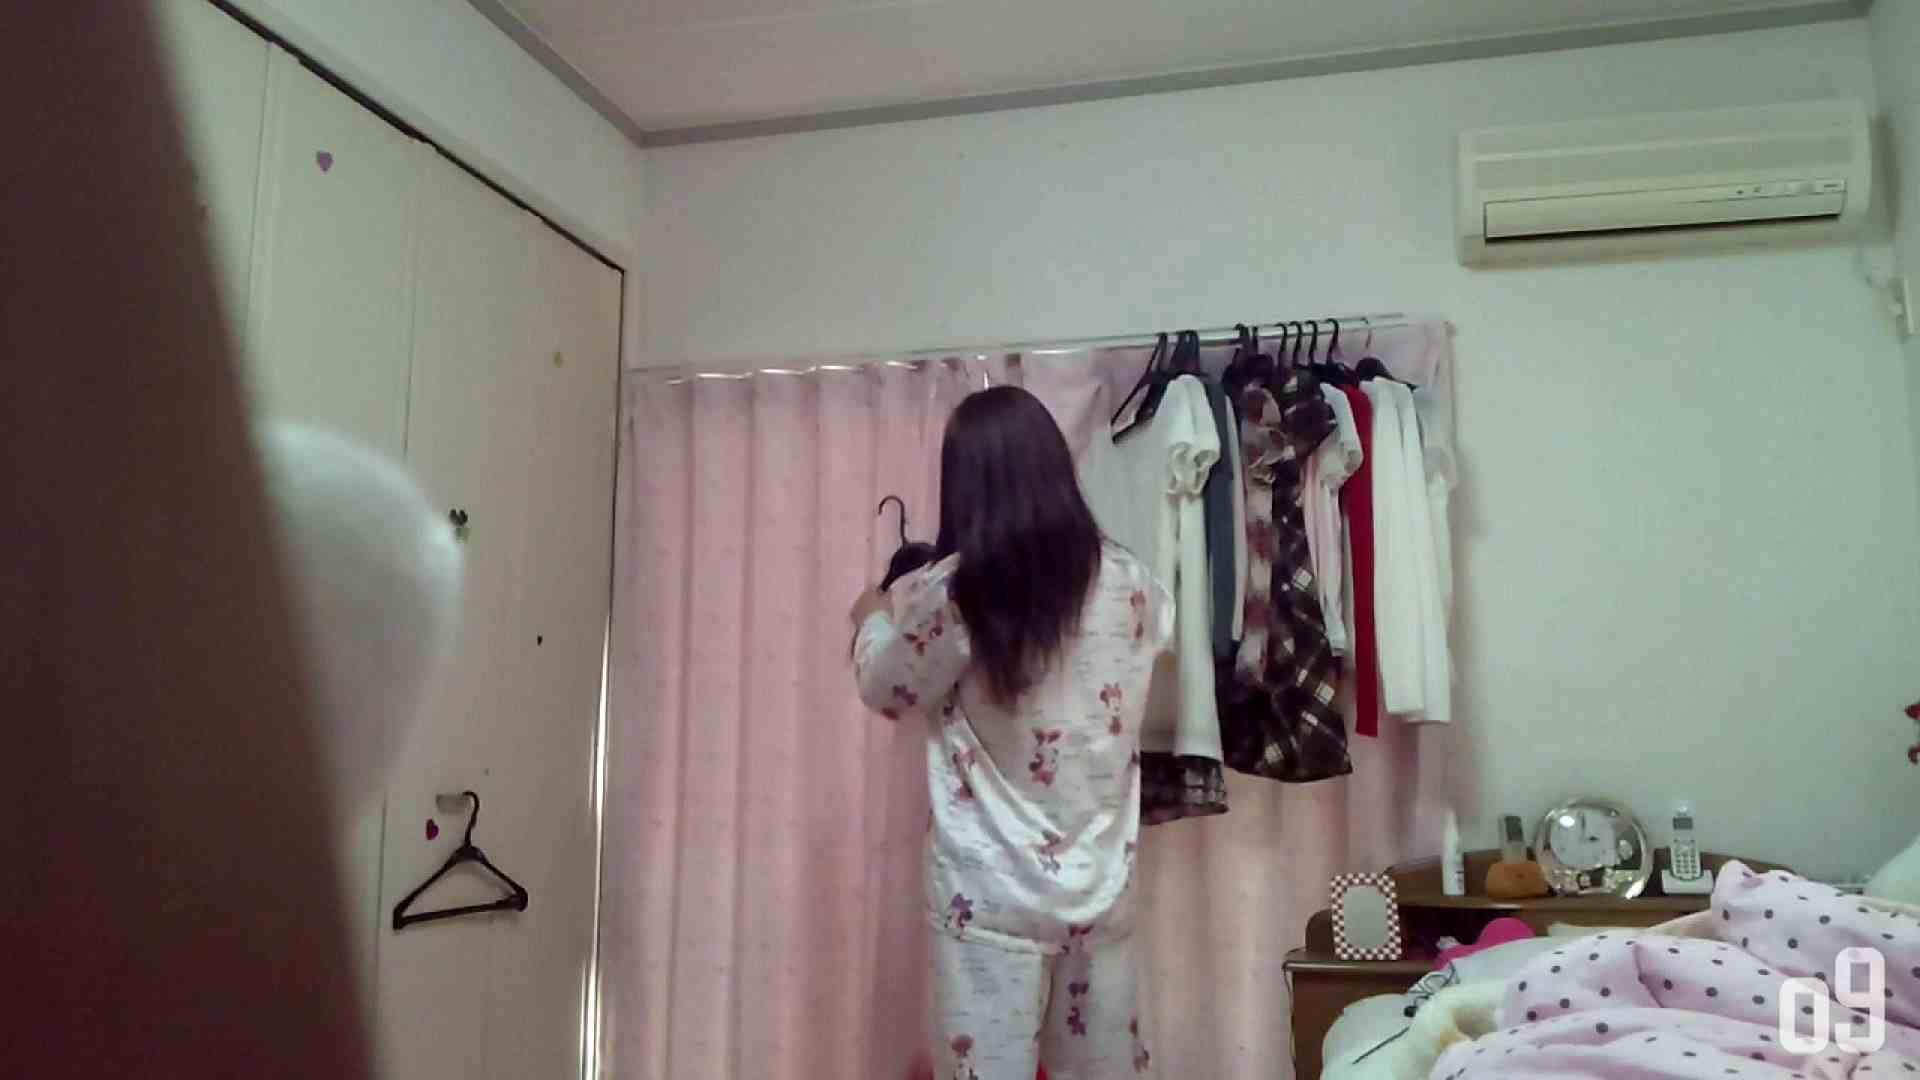 vol.2 瑞希ちゃんの自宅公開!寝起きの着替え・・・ラリルそー 着替え  77pic 18